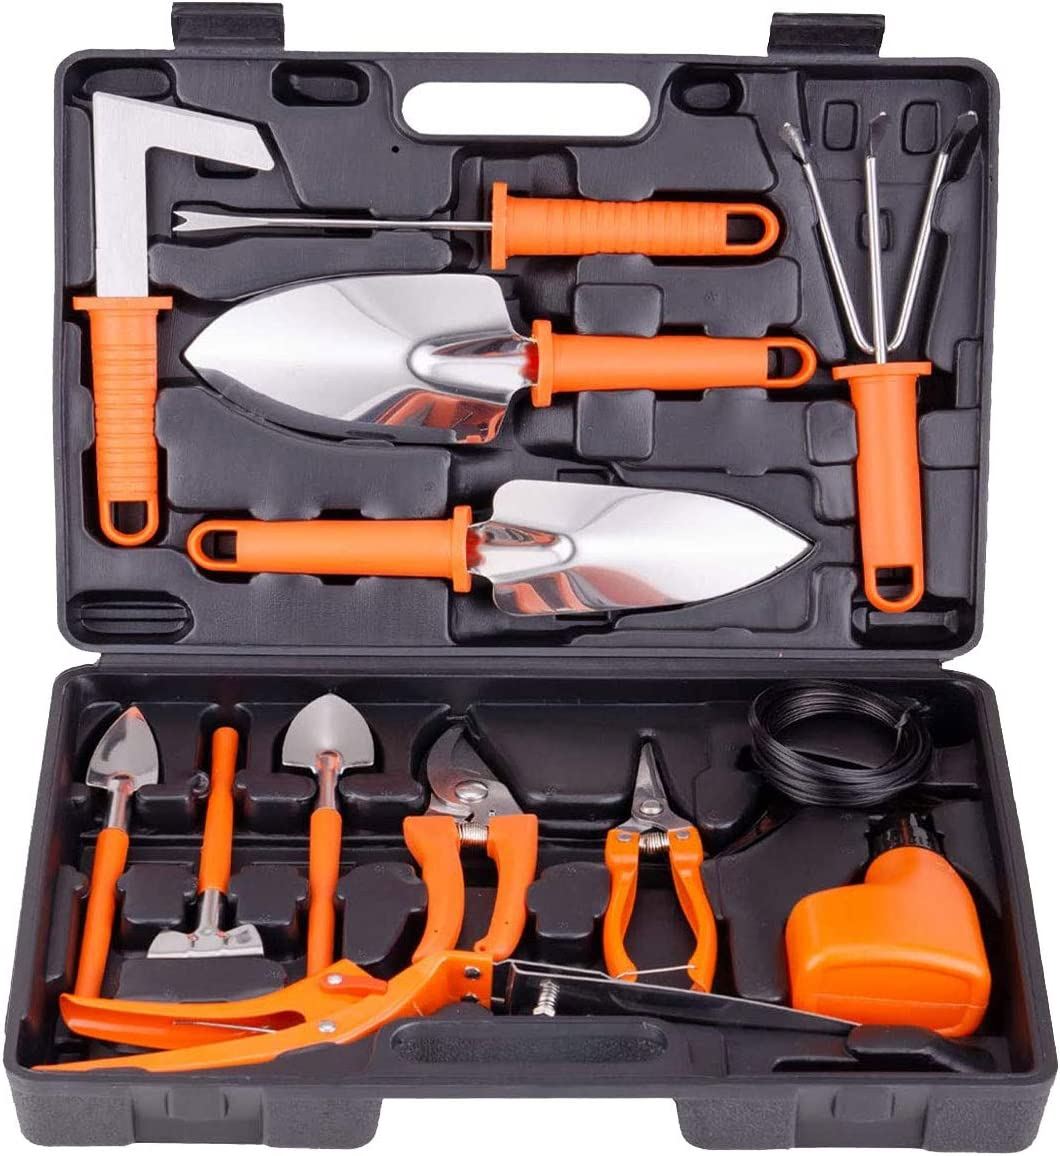 BNCHI Garden Tool Set, 13 Piece Stainless Steel Heavy Duty Gardening Tool Set, Gardening Tools for Women/Men (Orange)